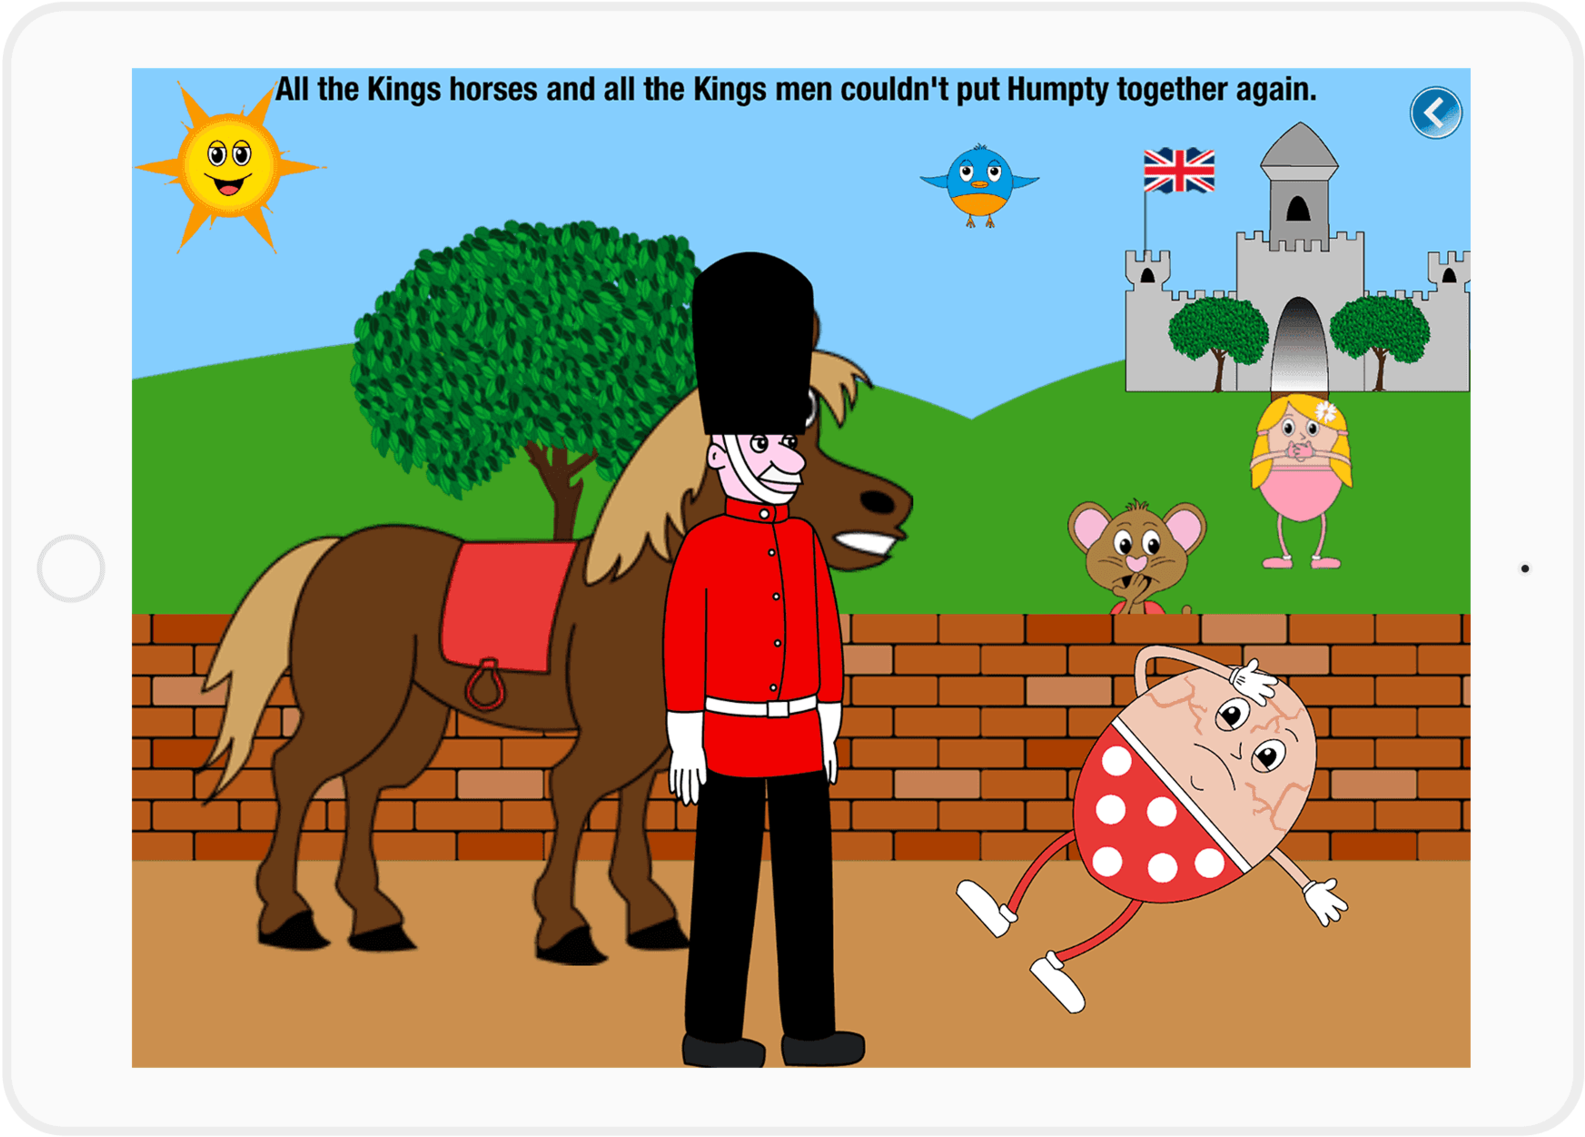 Humpty dumpty clipart king. Kings horse cartoon transparent